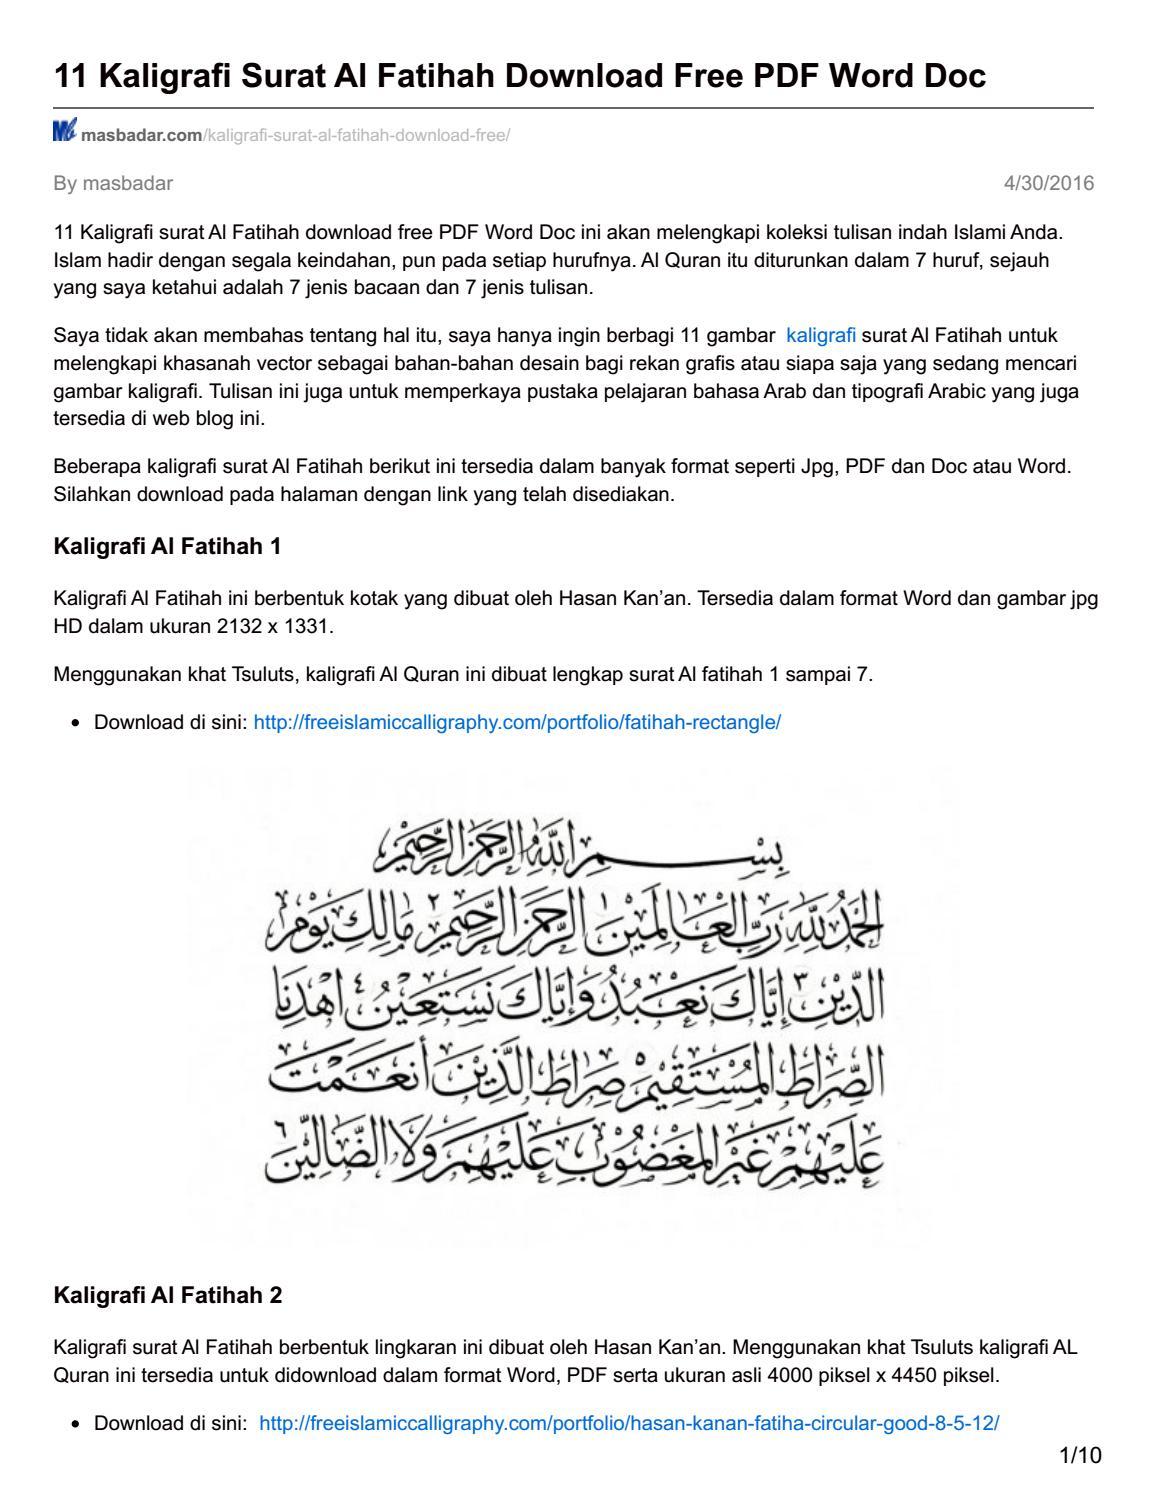 Masbadar Com 11 Kaligrafi Surat Al Fatihah Download Free Pdf Word